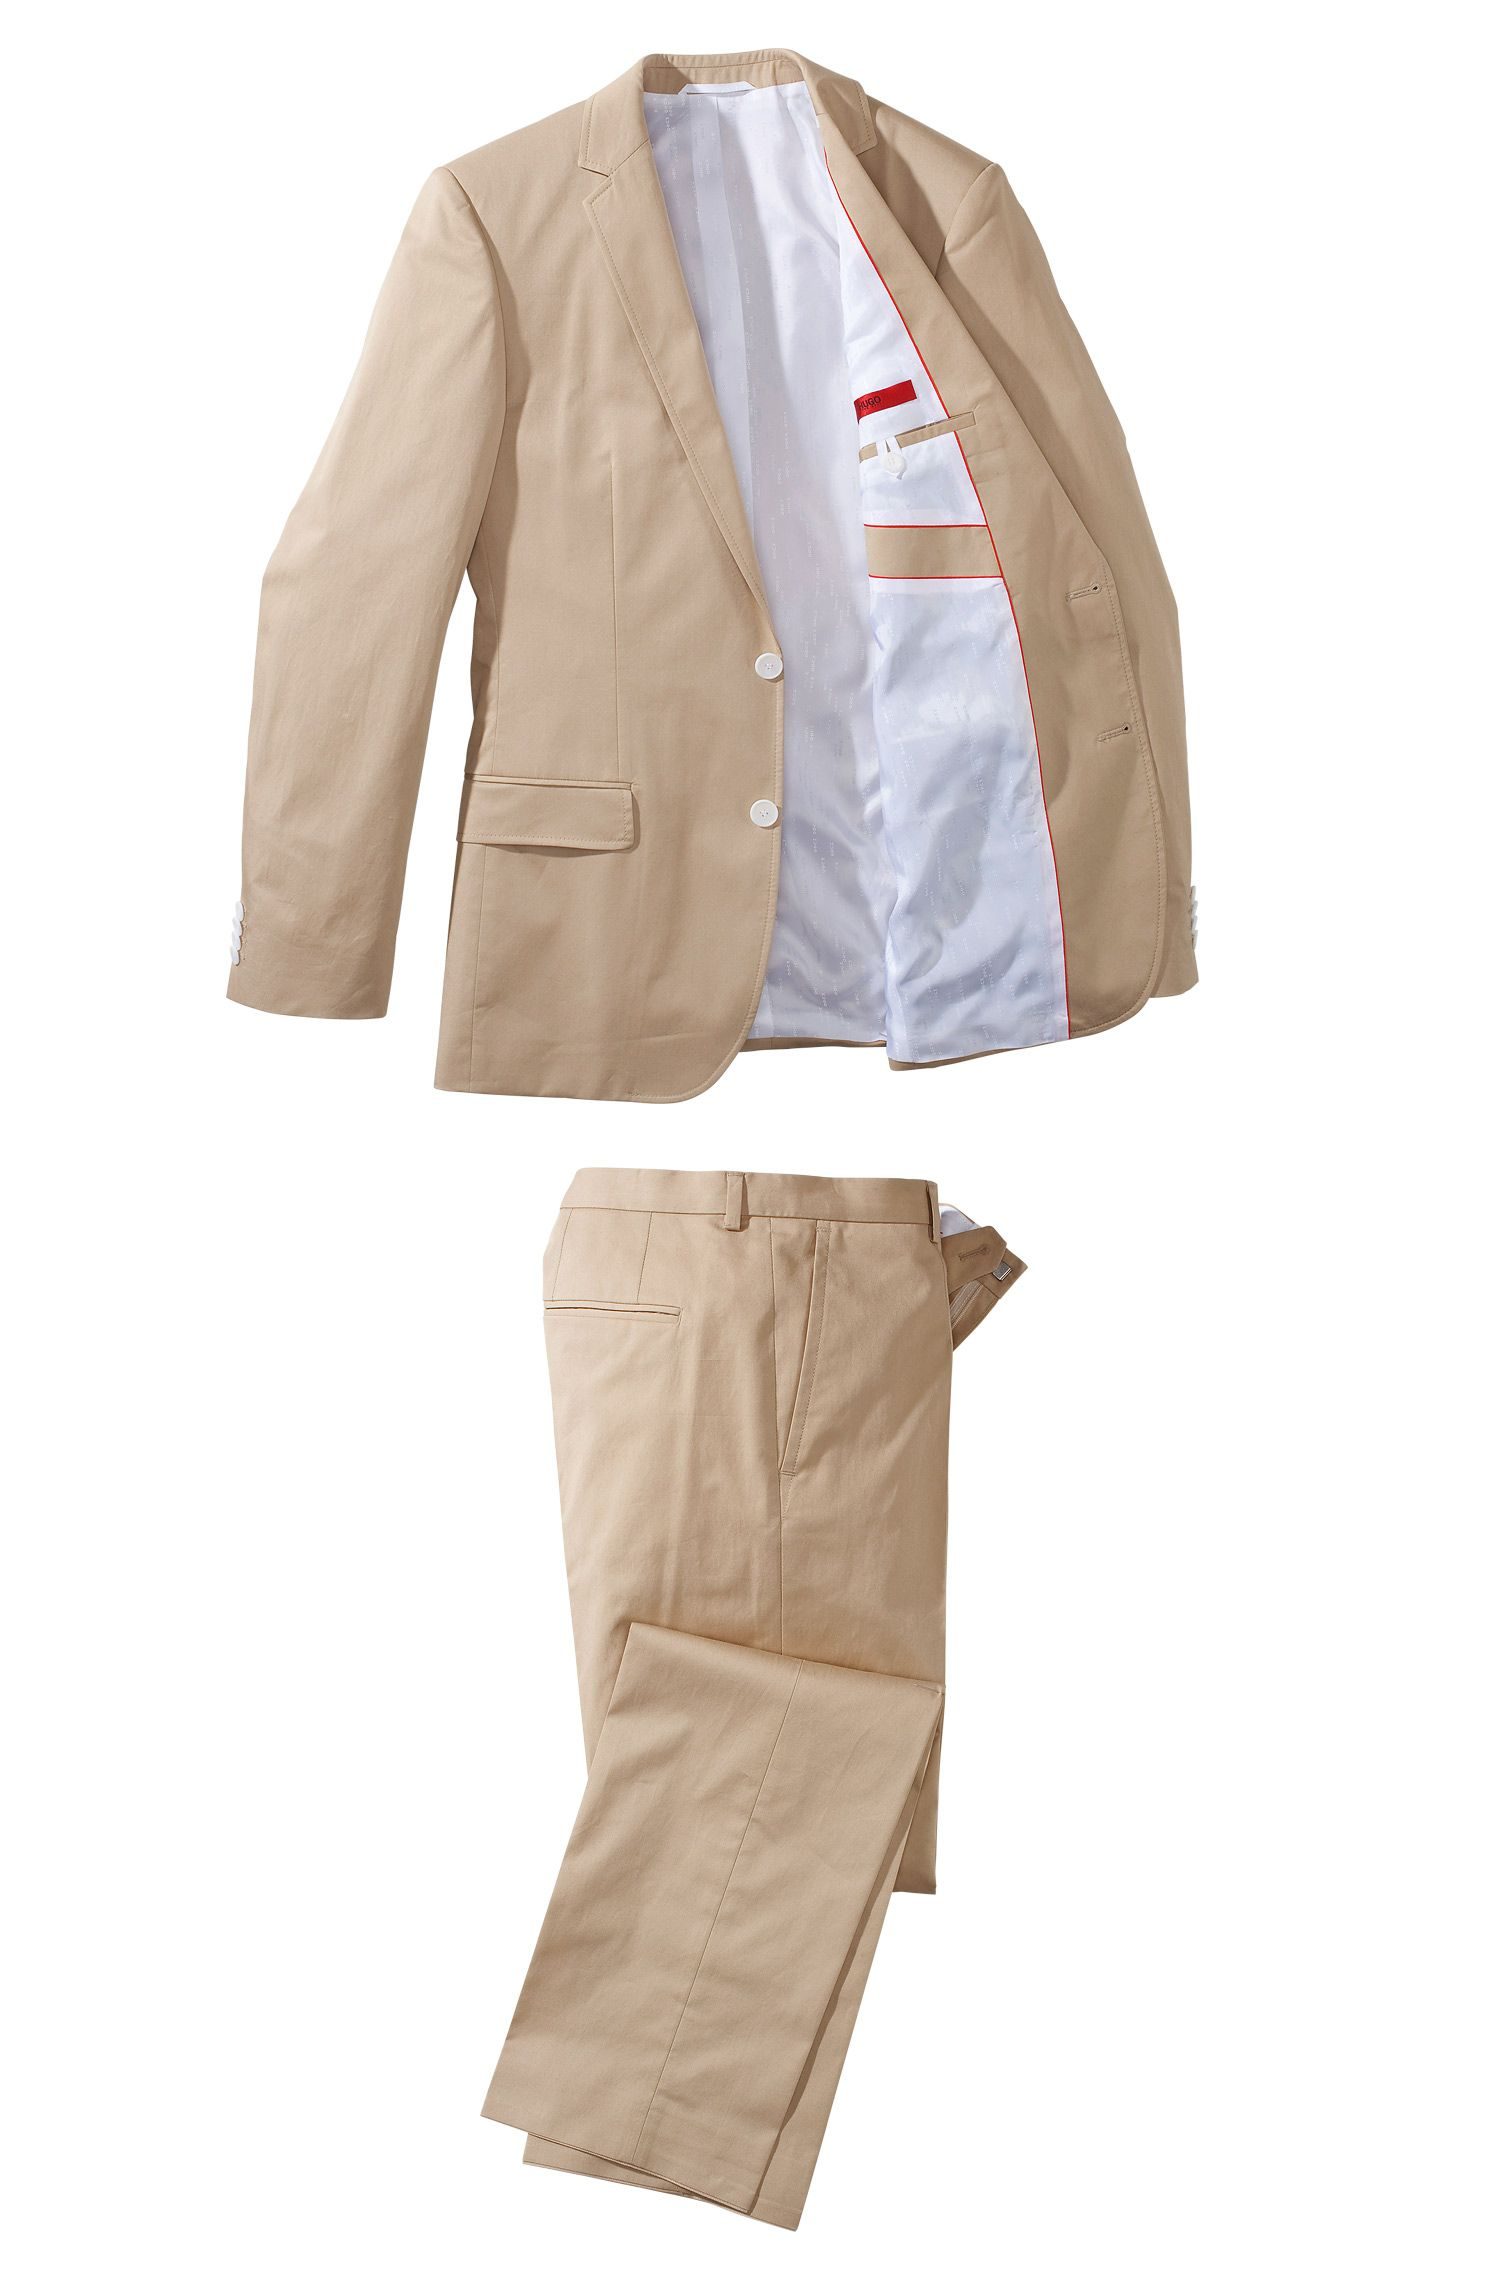 Costume Slim Fit en coton, Aiko1/Heise